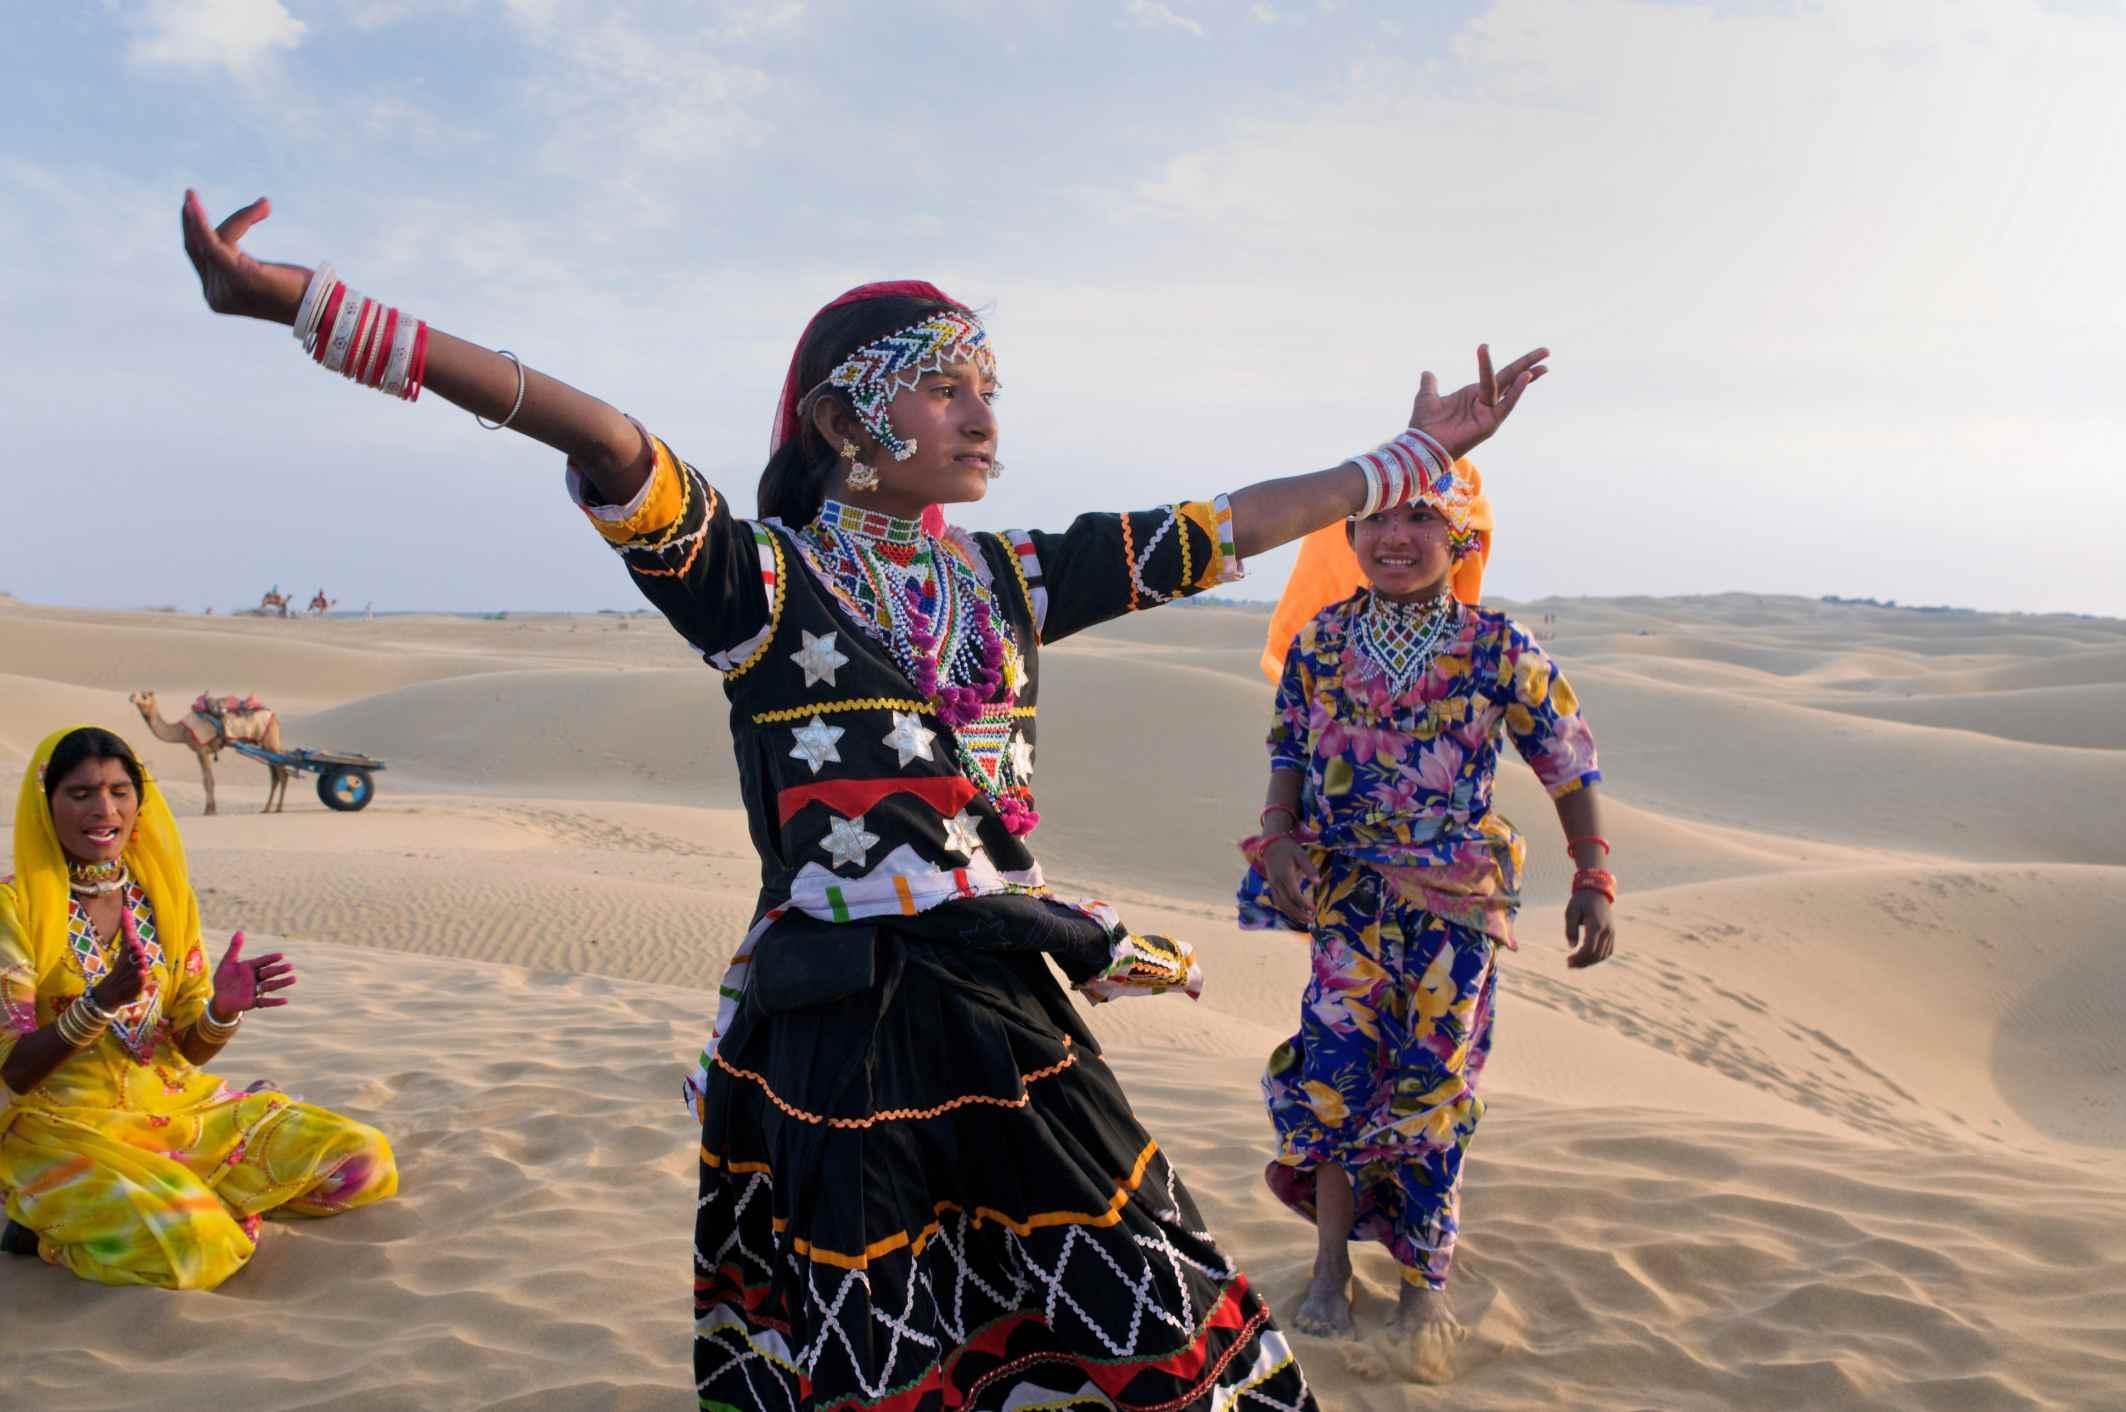 Dancers at Sam Sand Dunes near Jaisalmer, India